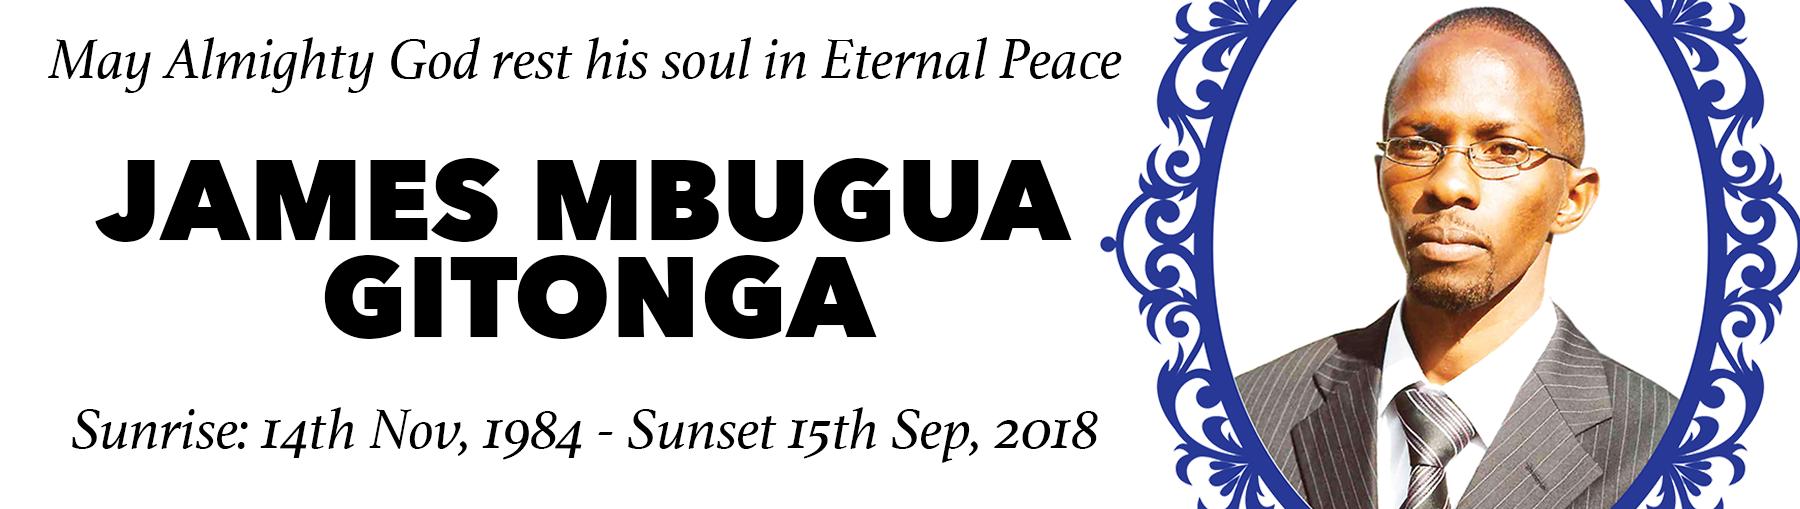 JAMES MBUGUA GITONGA